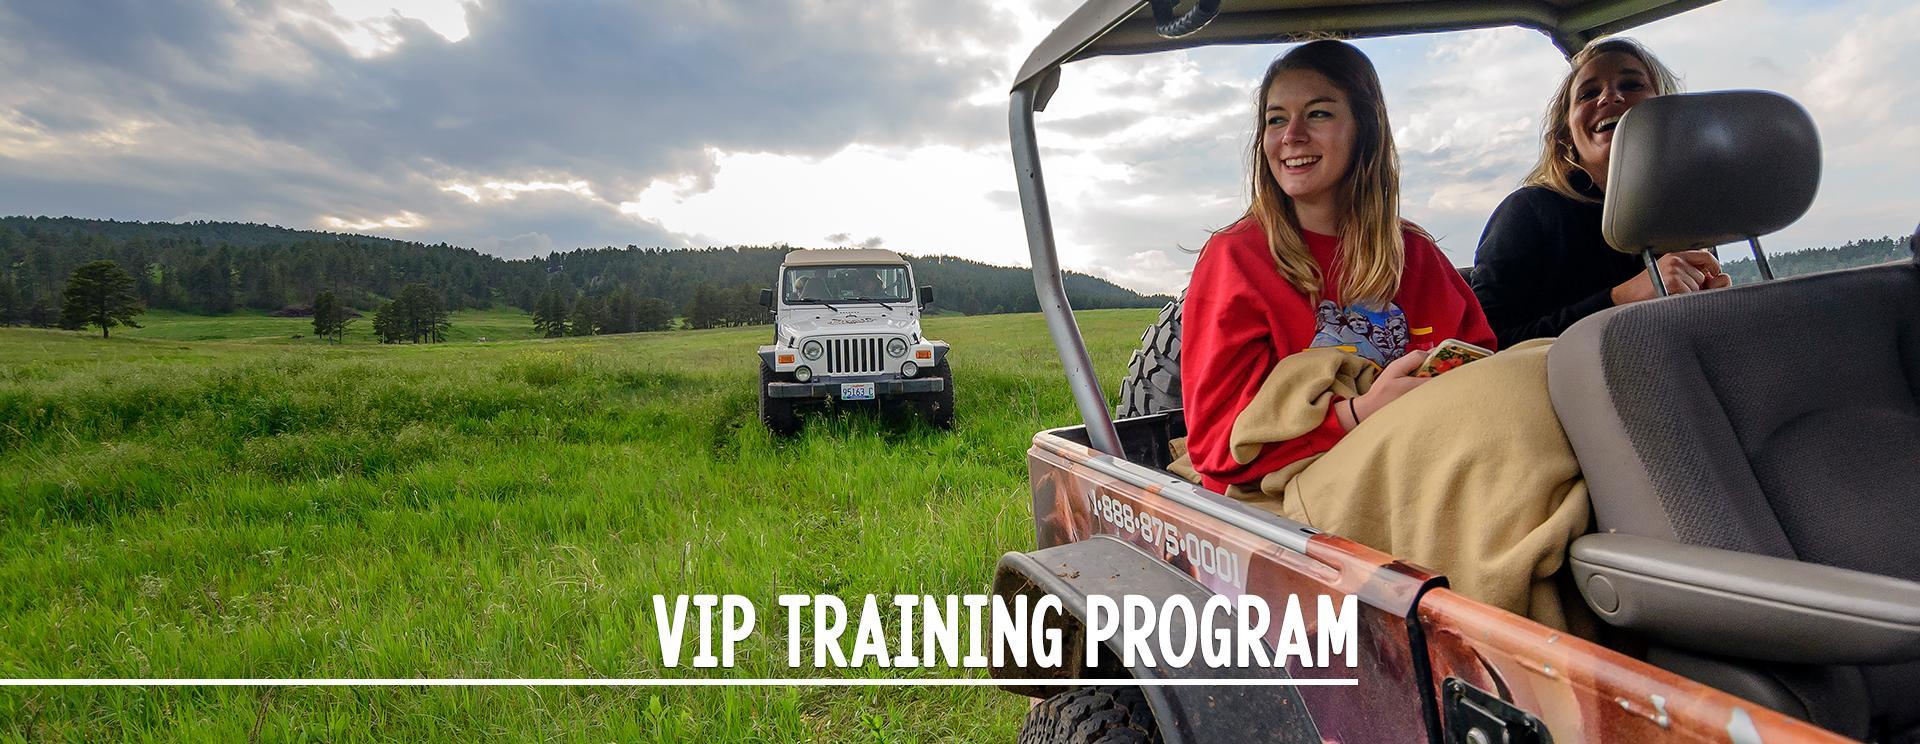 VIP Training Cards